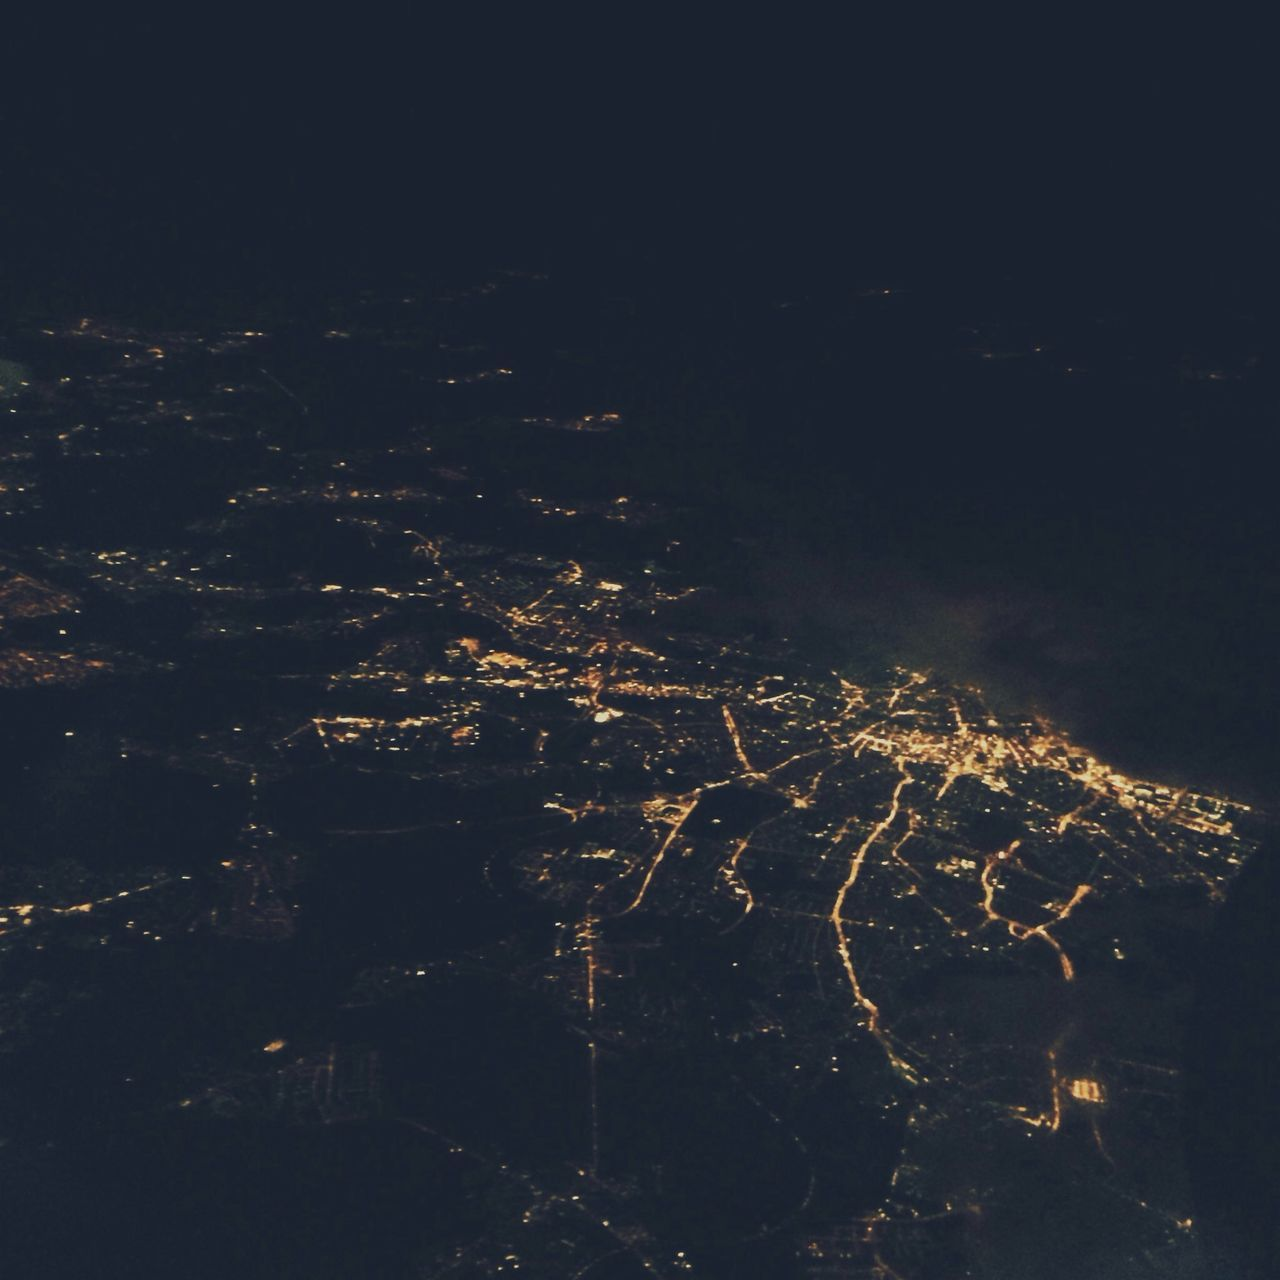 night, illuminated, no people, dark, outdoors, scenics, beauty in nature, nature, sky